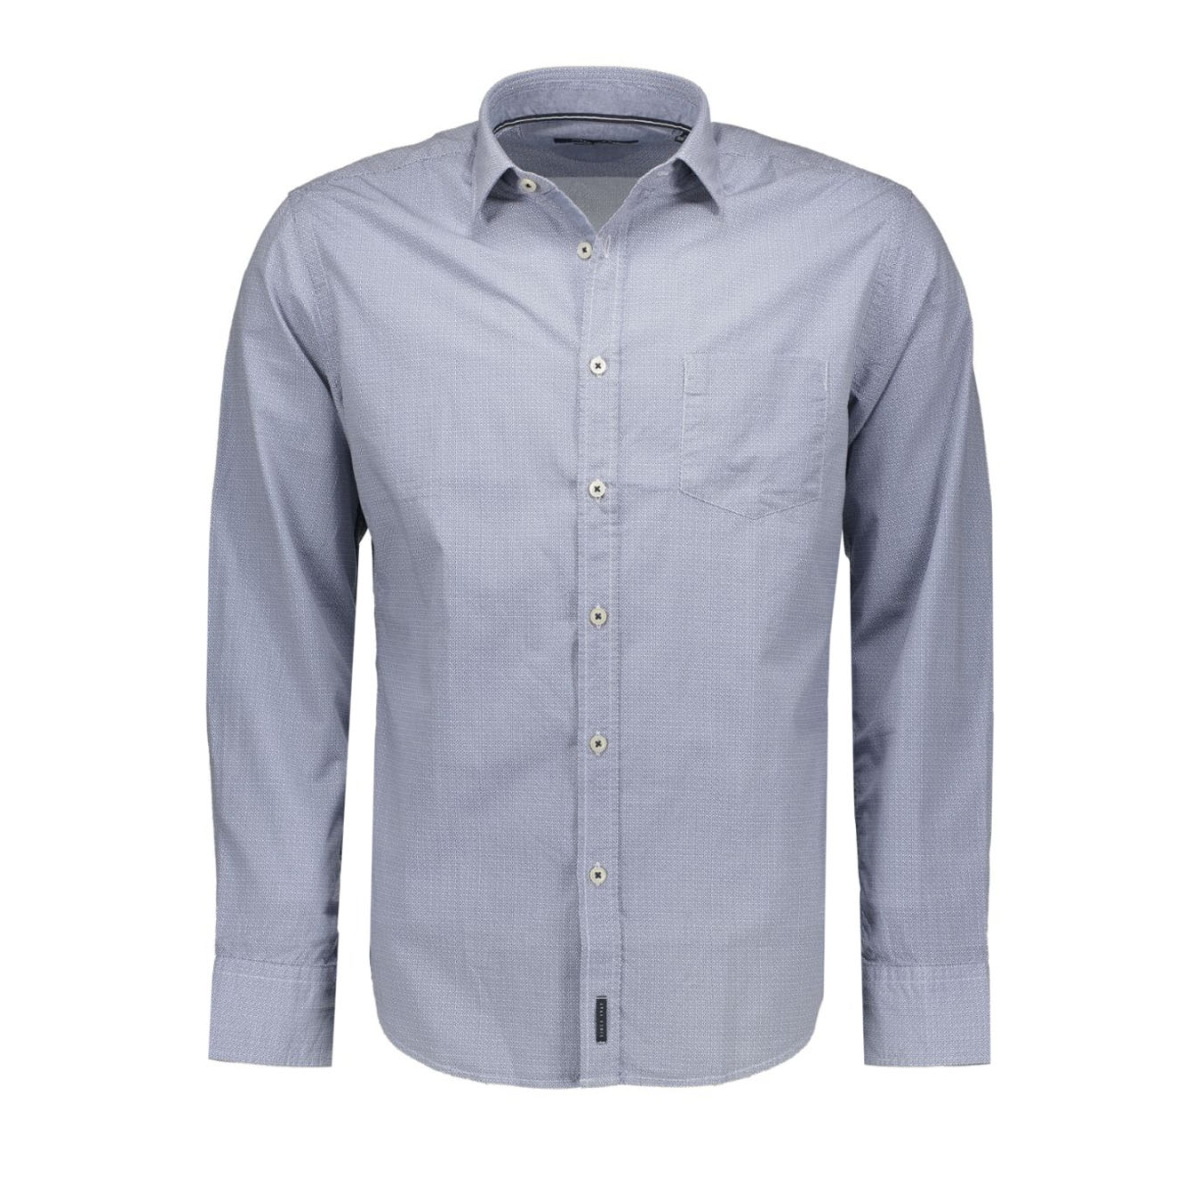 620 1536 42314 marc o`polo overhemd f80